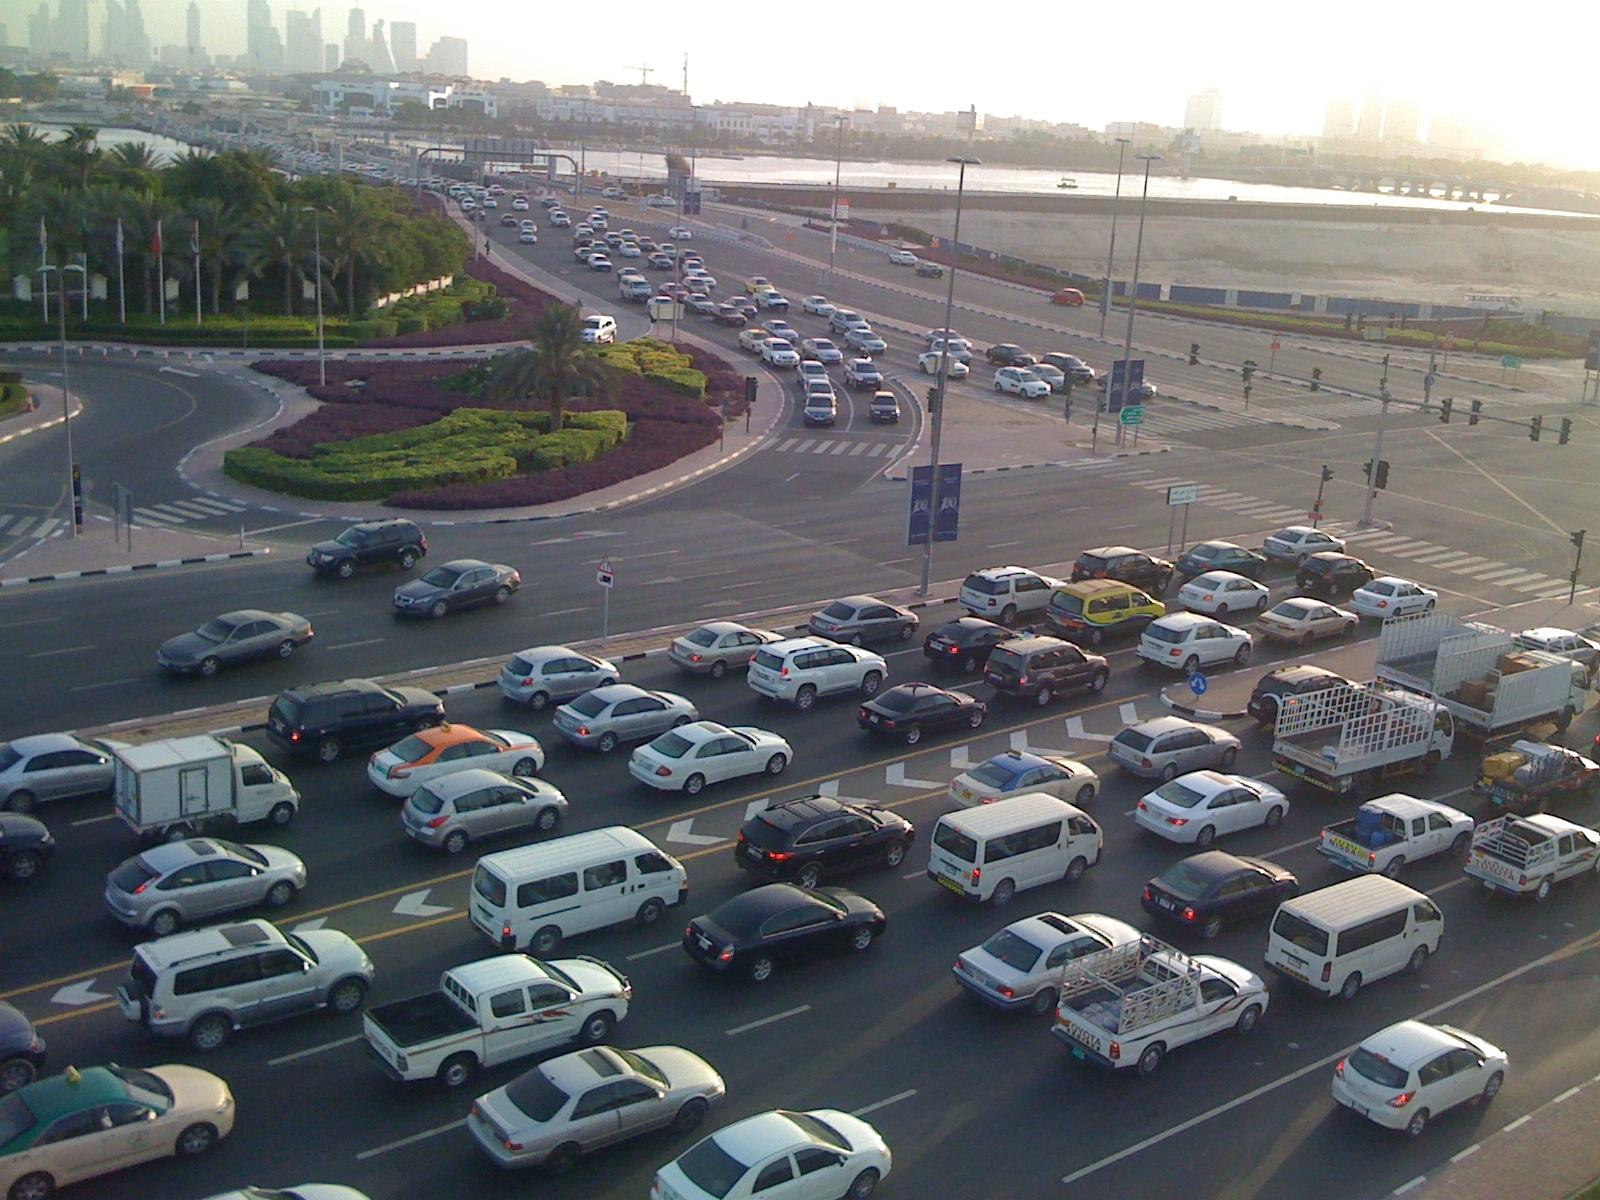 Inside the Middle East: Dubai « - CNN com Blogs